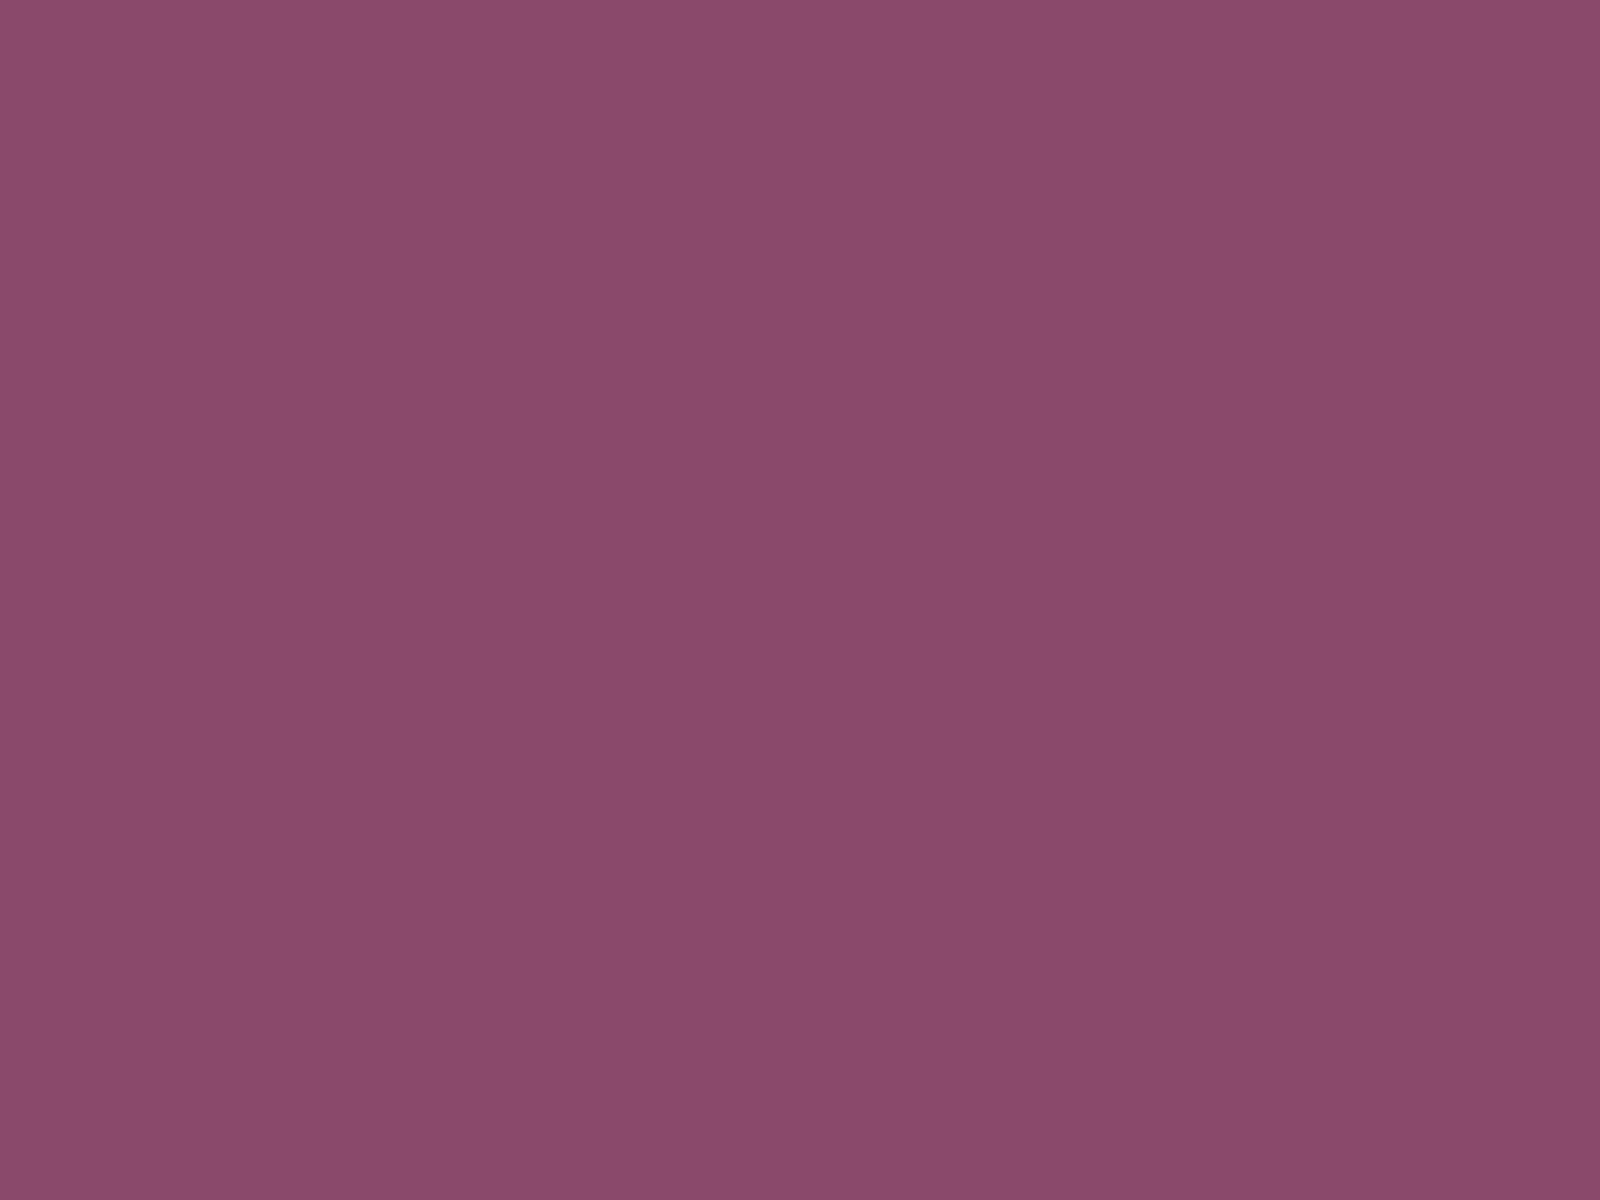 1600x1200 Twilight Lavender Solid Color Background